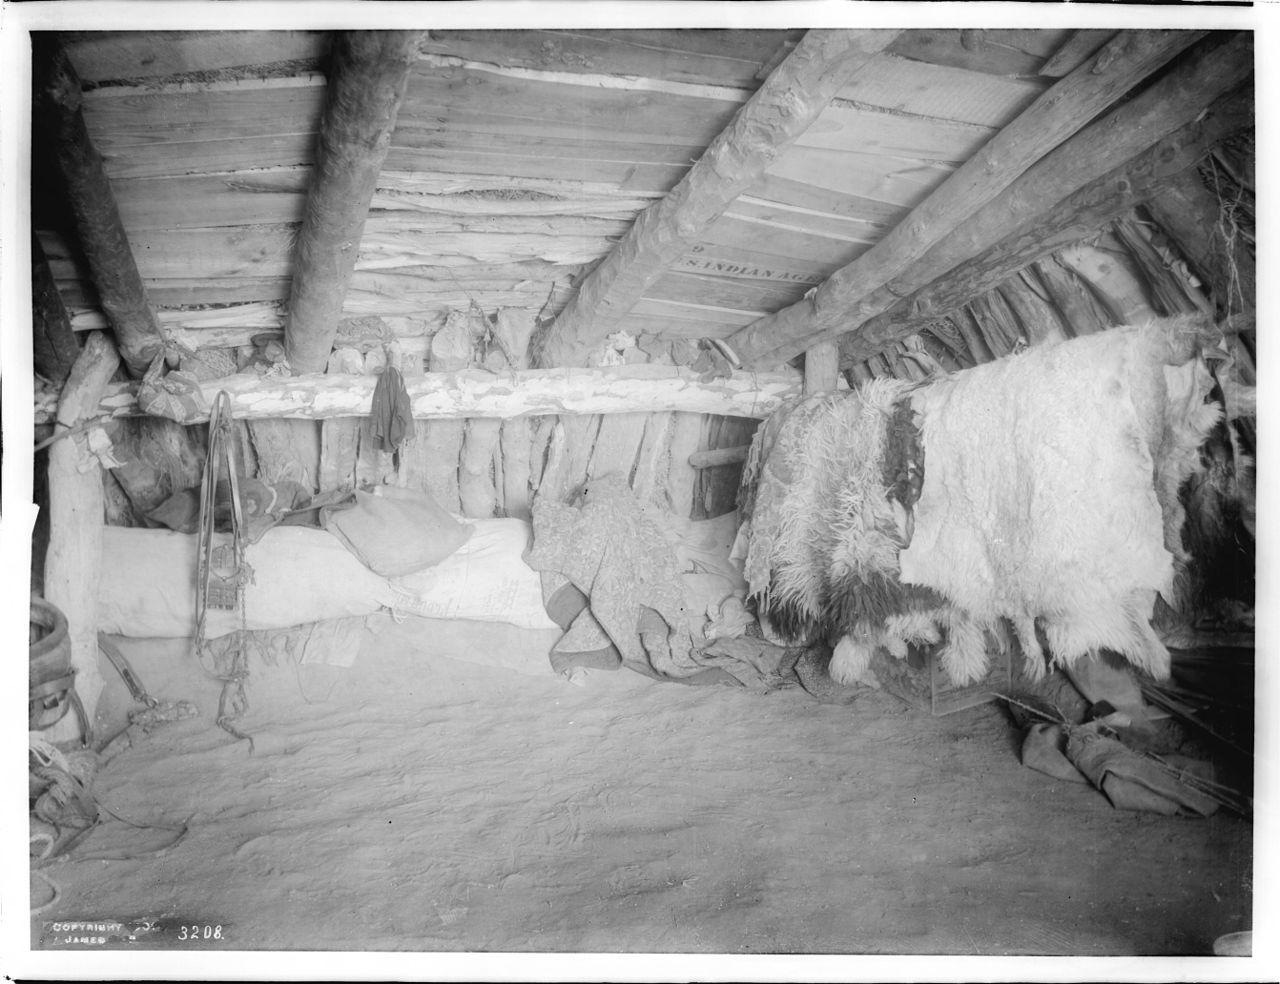 FileInterior Of A Navajo Hogan Ca1901 CHS 3208jpg